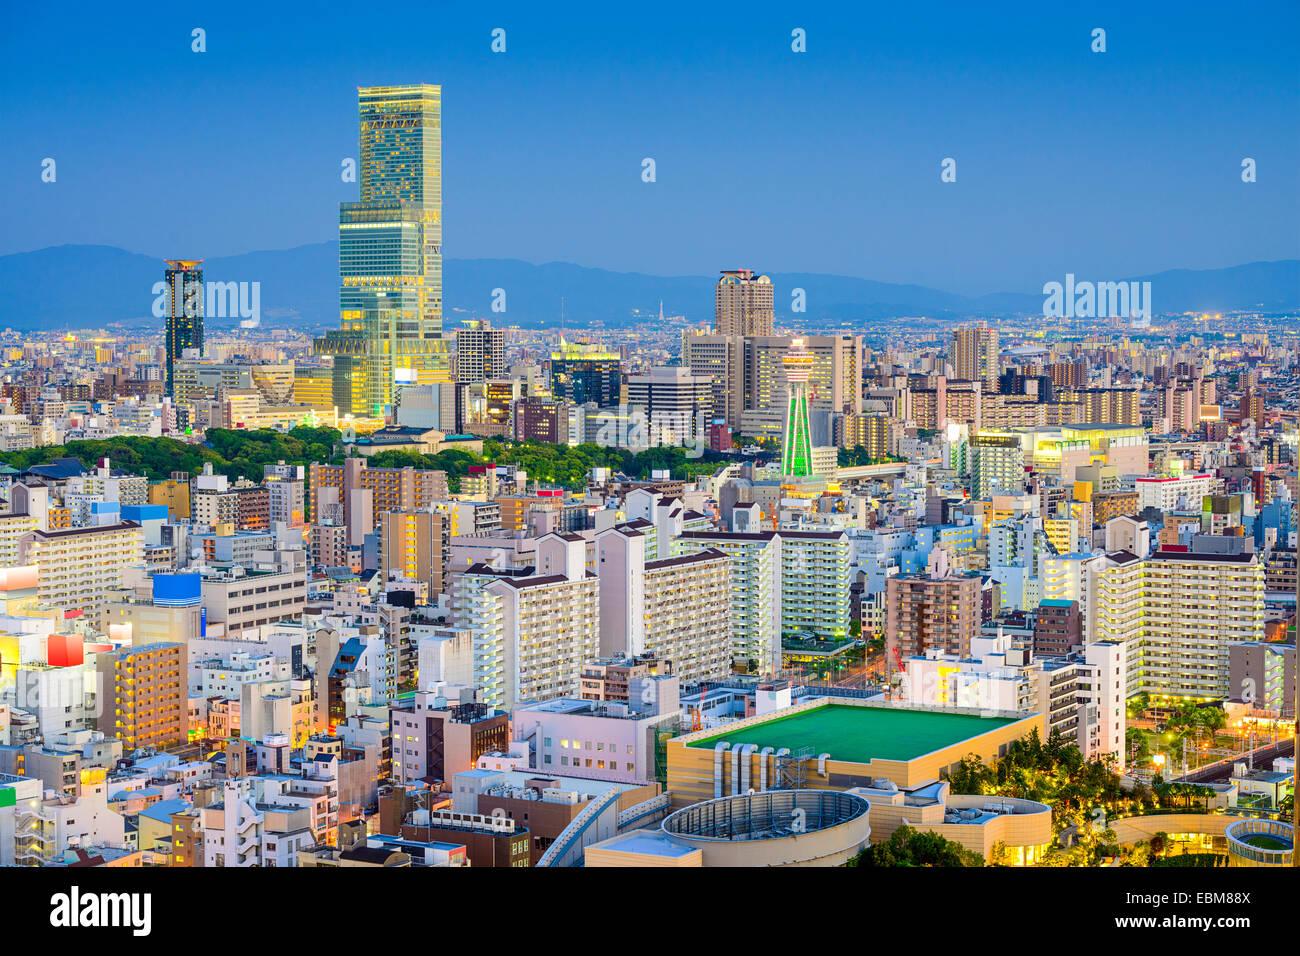 Osaka, Japón paisaje urbano vista de Abeno y Shinsekai distritos. Imagen De Stock